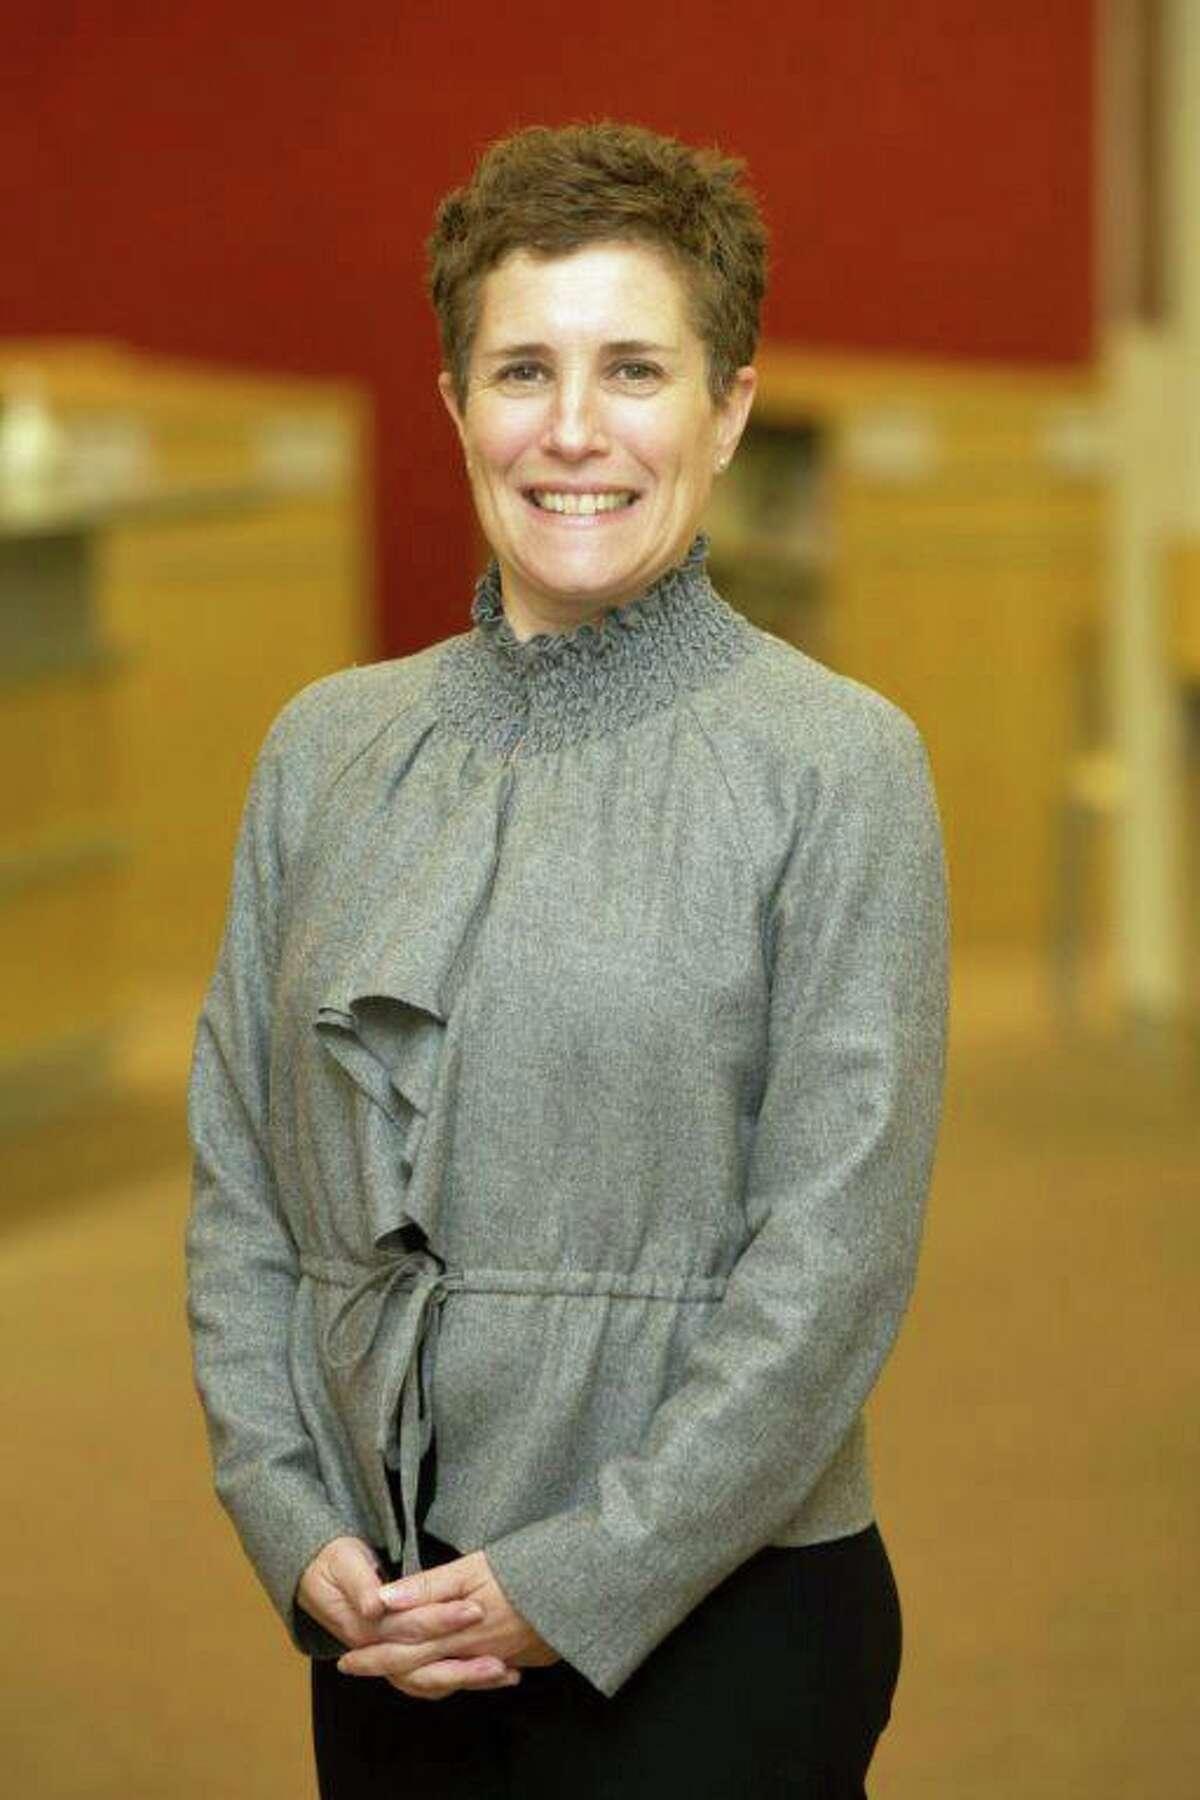 Regional School District 17 Haddam-Killingworth Superintendent of Schools Holly Hageman